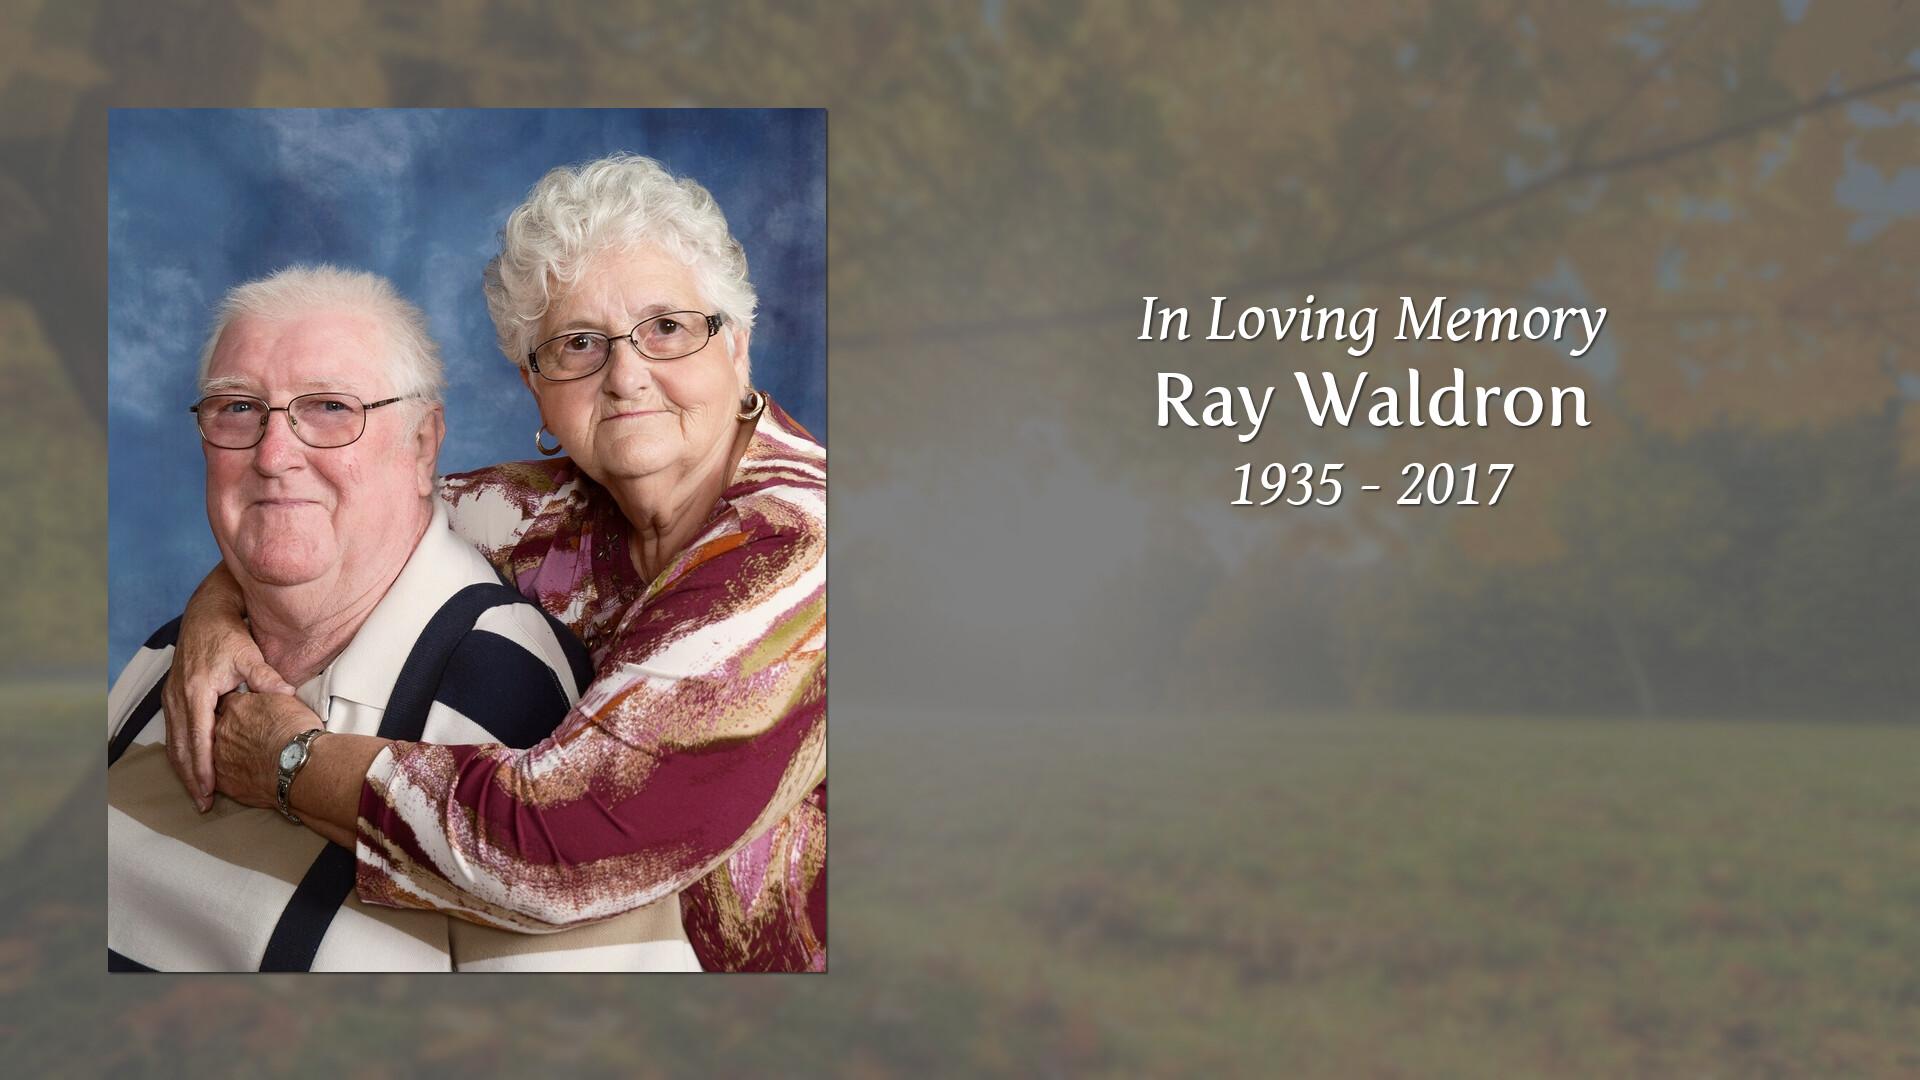 Lifestory for Ray Waldron